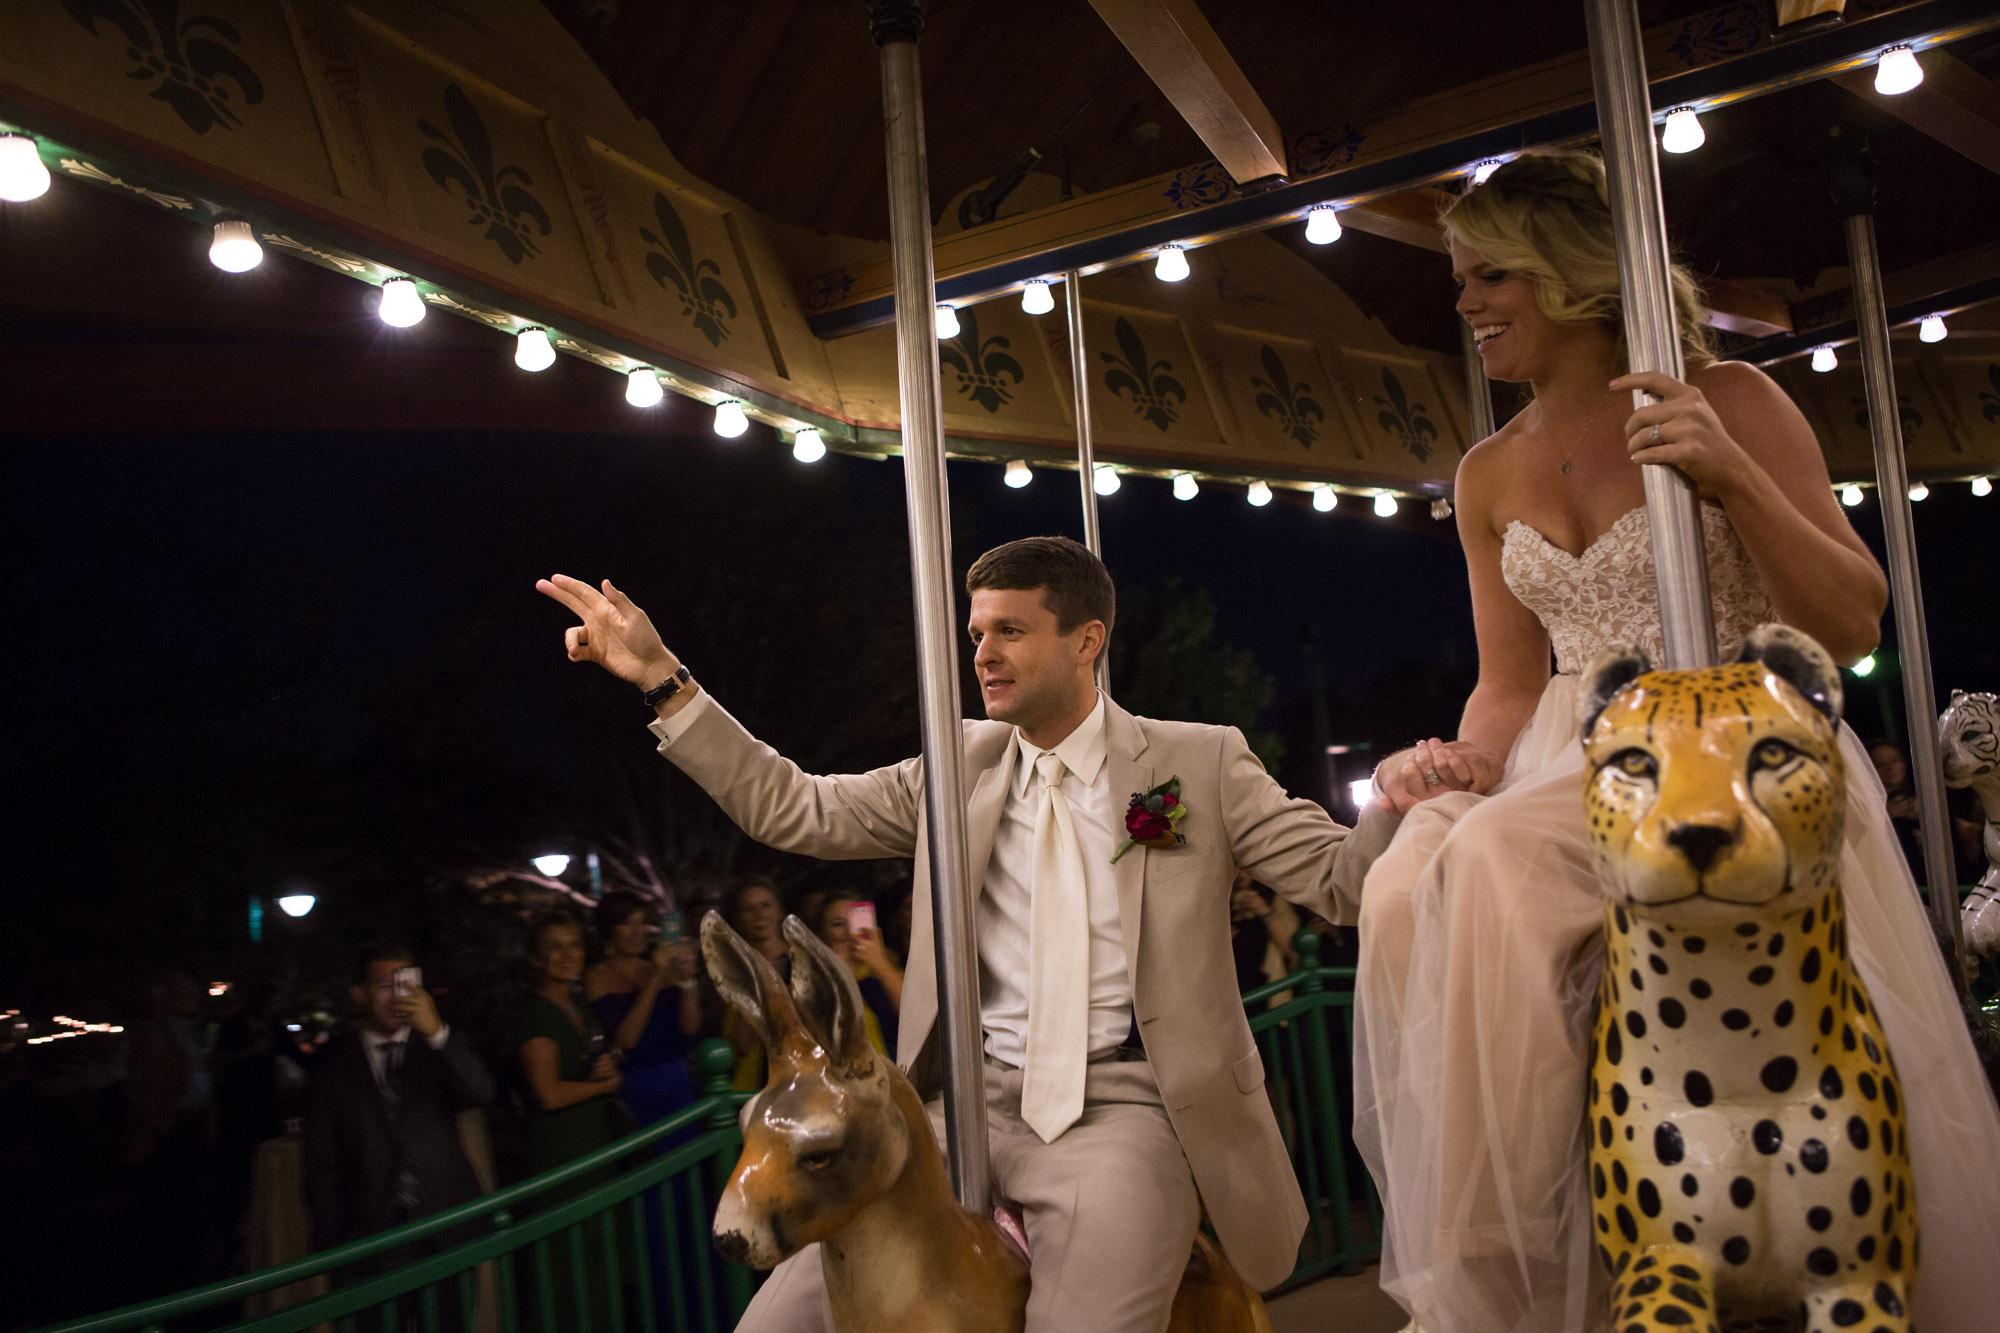 wedding carousel ride